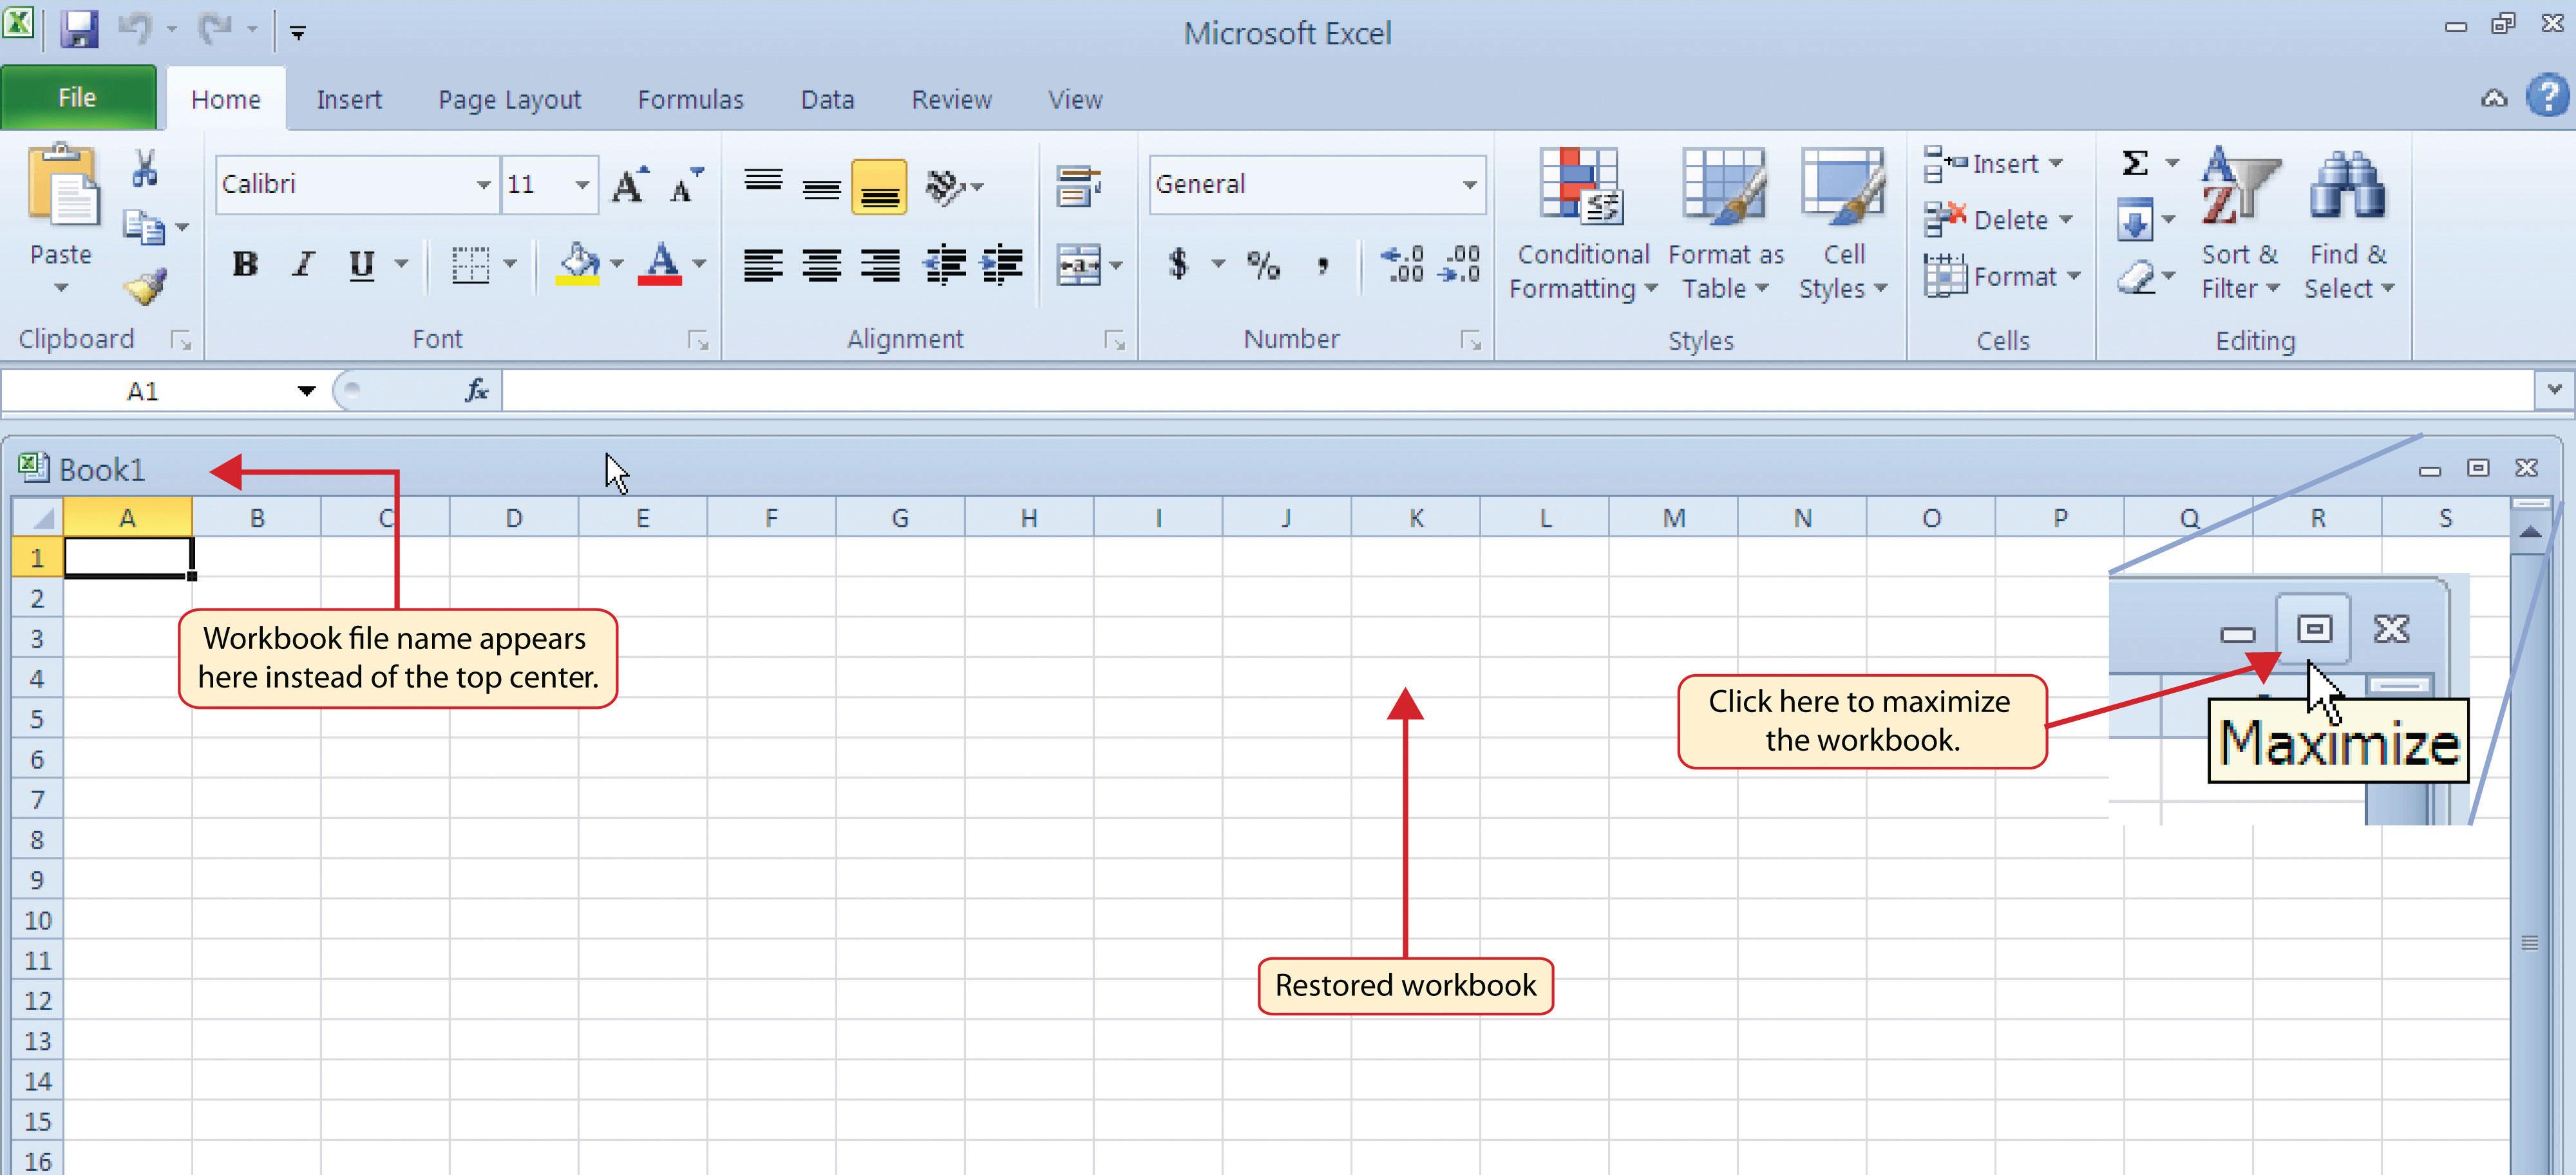 Uncategorized Worksheet In Excel how to use microsoft excel the careers in practice restored worksheet